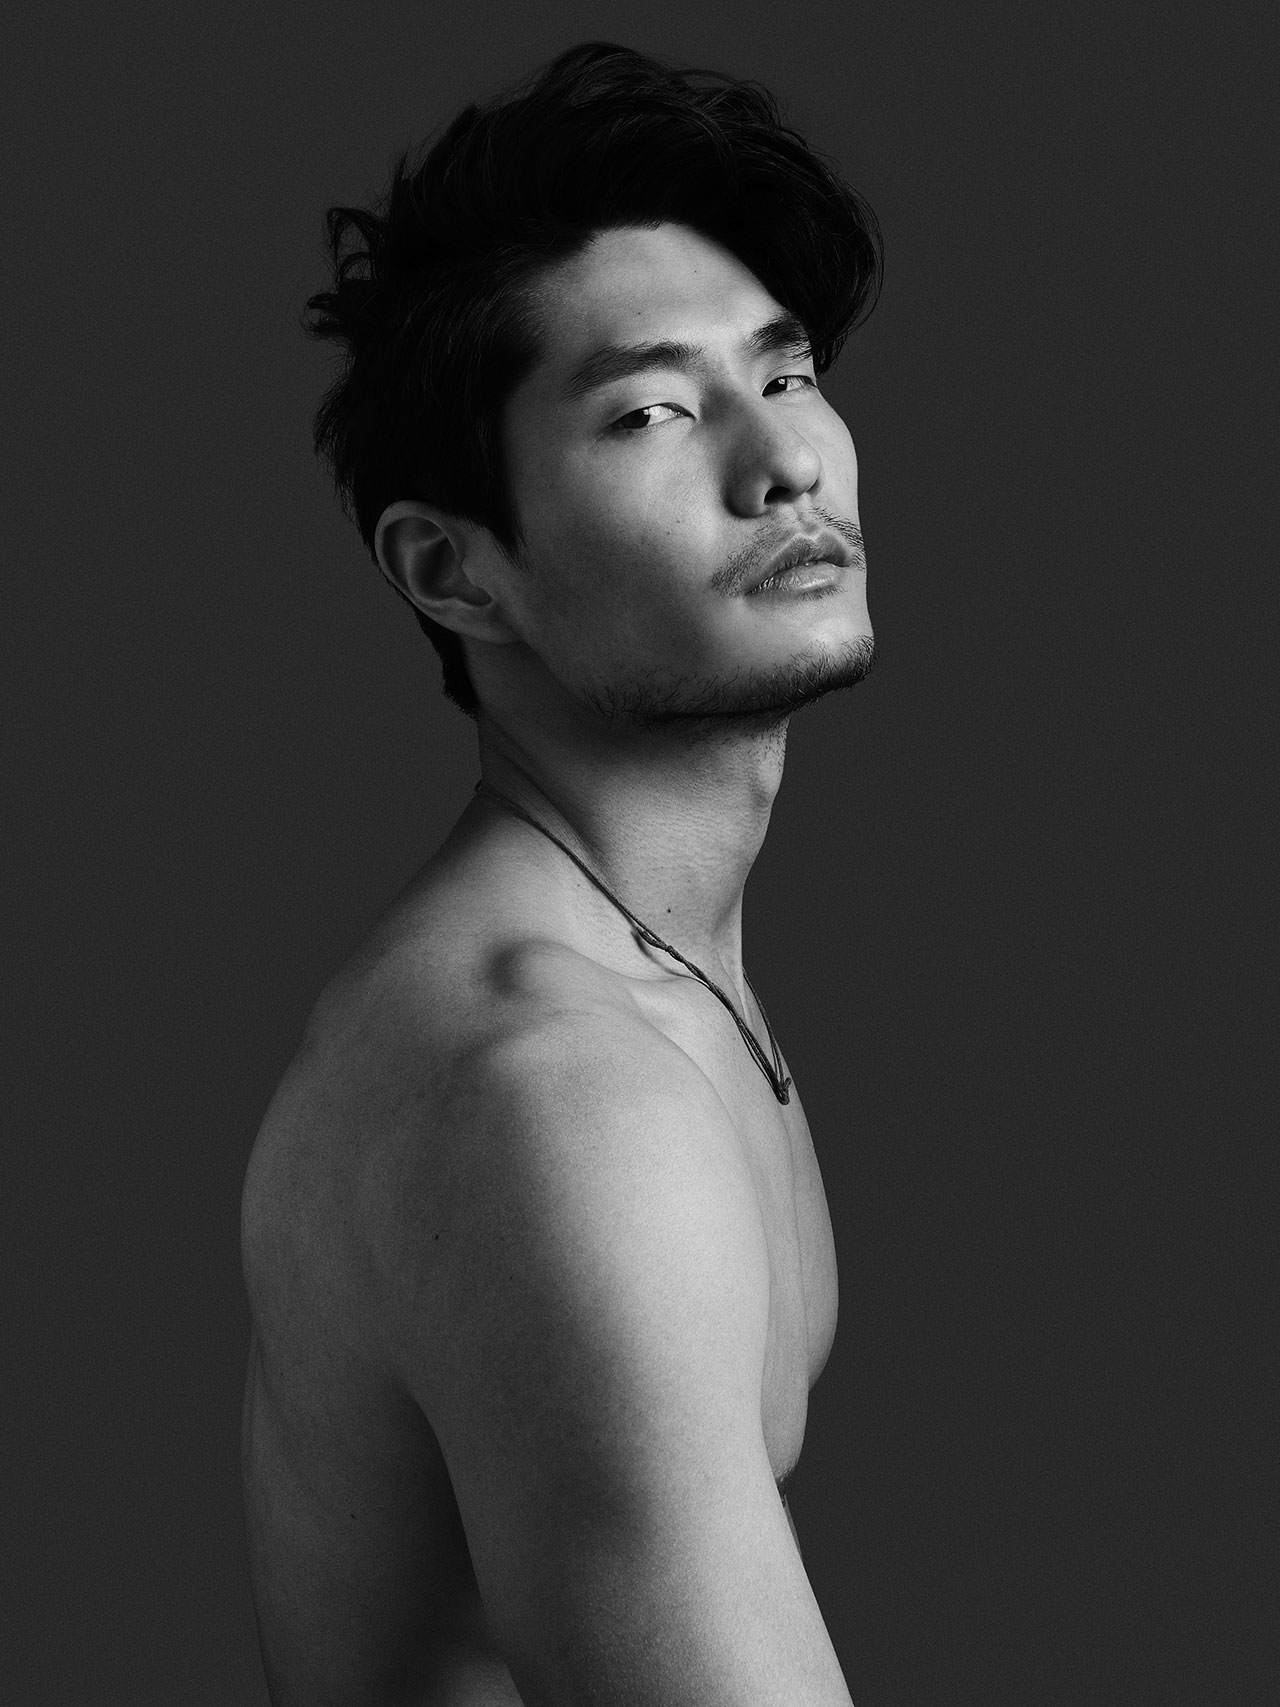 Asian man model